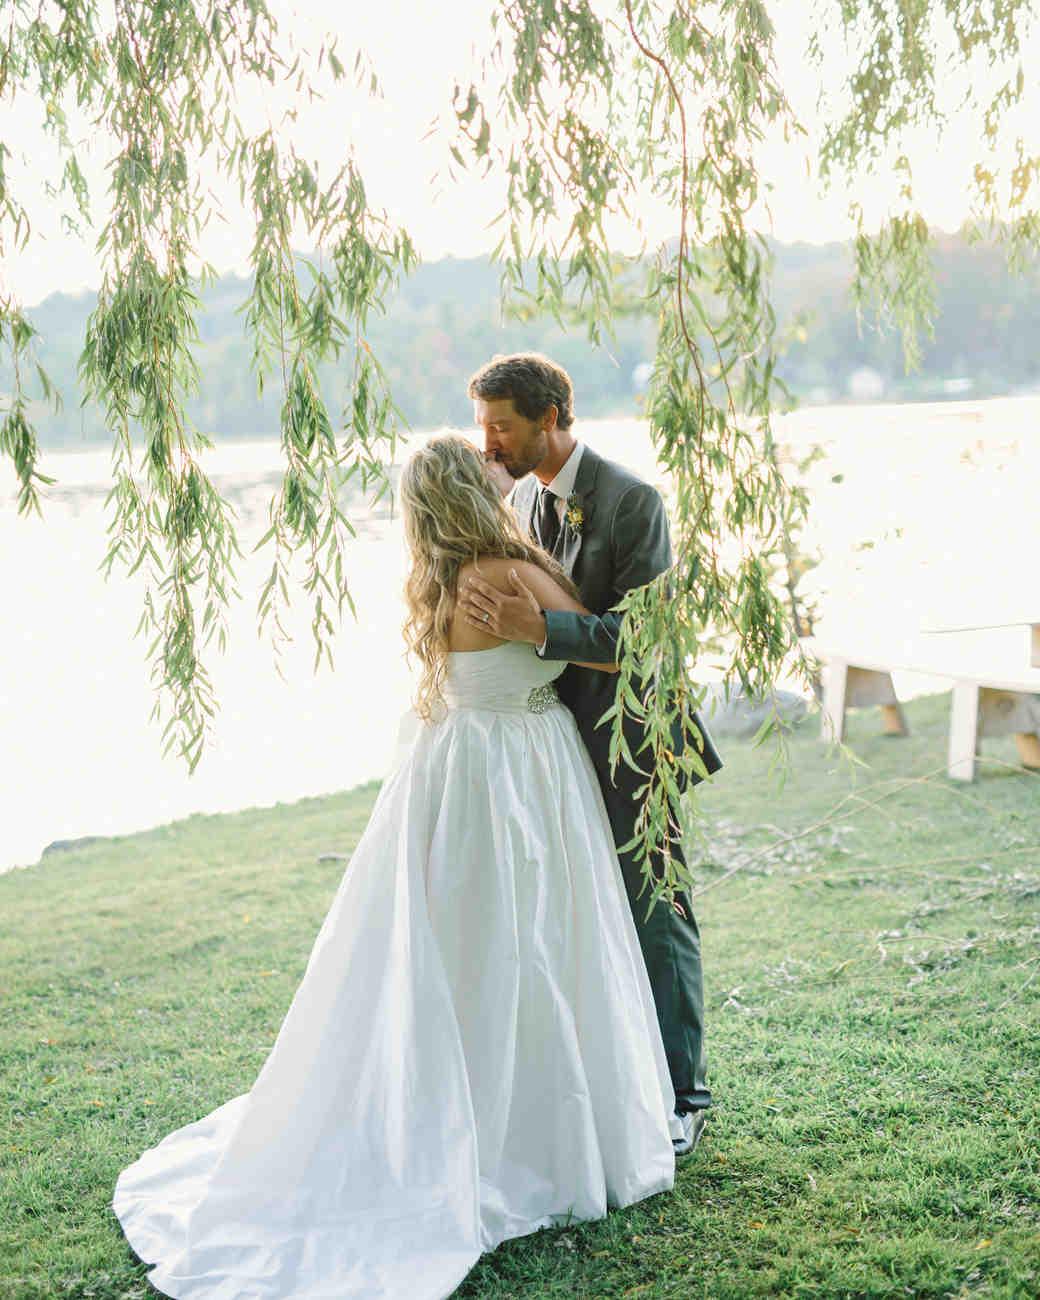 lizzy-bucky-wedding-couple-503-s111857-0315.jpg